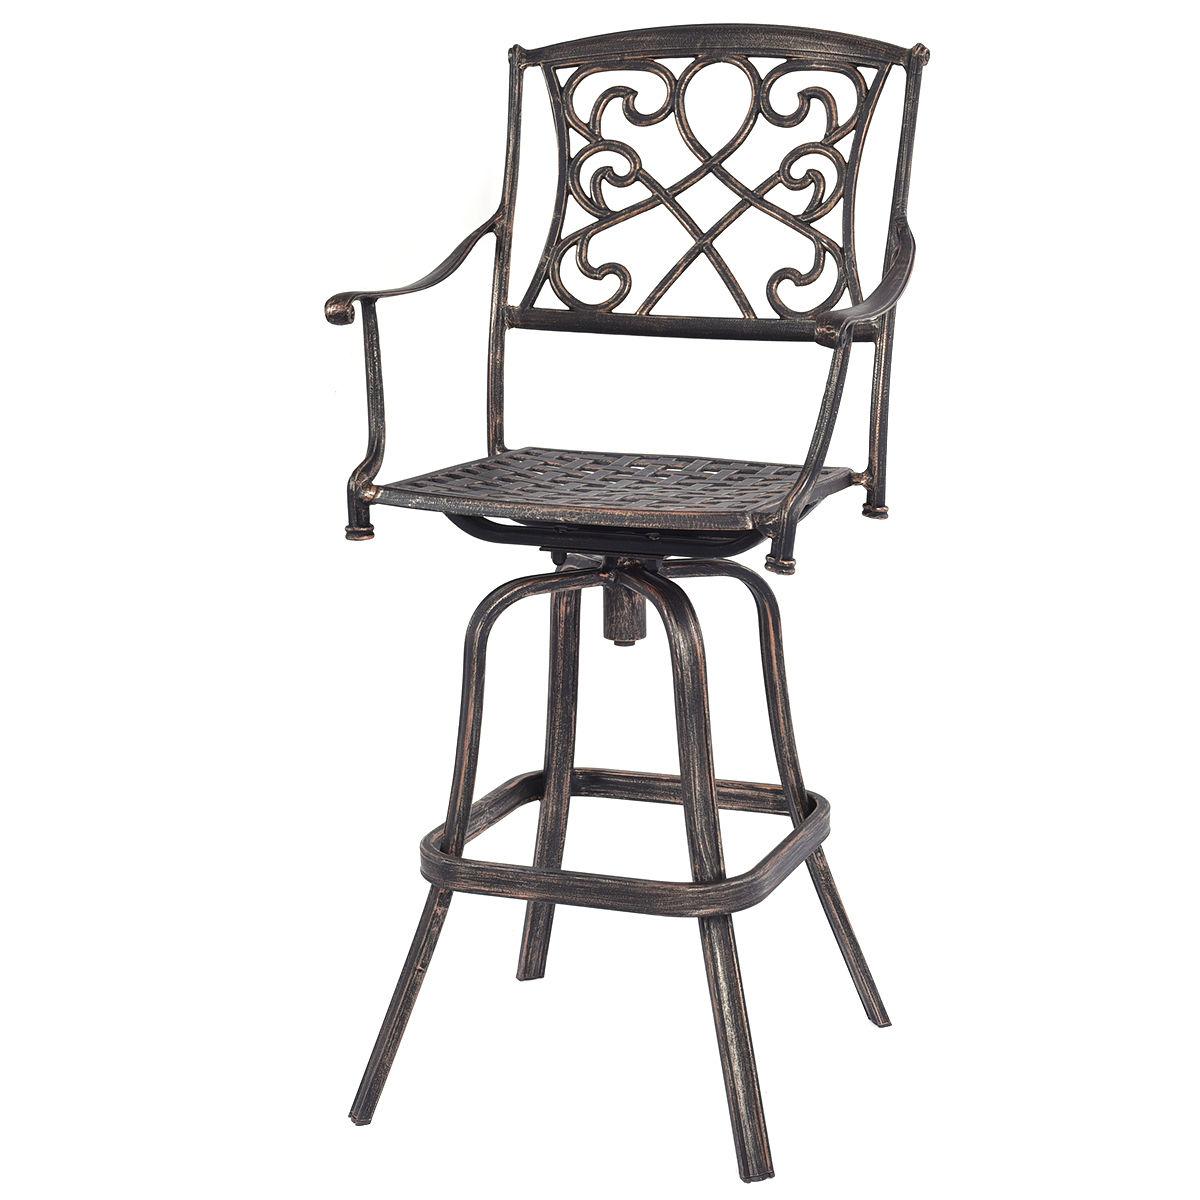 Giantex Cast Aluminum Swivel Bar Stool Patio Furniture Antique Copper Design Bar Chairs Vintage Outdoor Pub Stool Chair HW52421 bar chairs stylish high chair bar stool lift swivel minimalist new specials